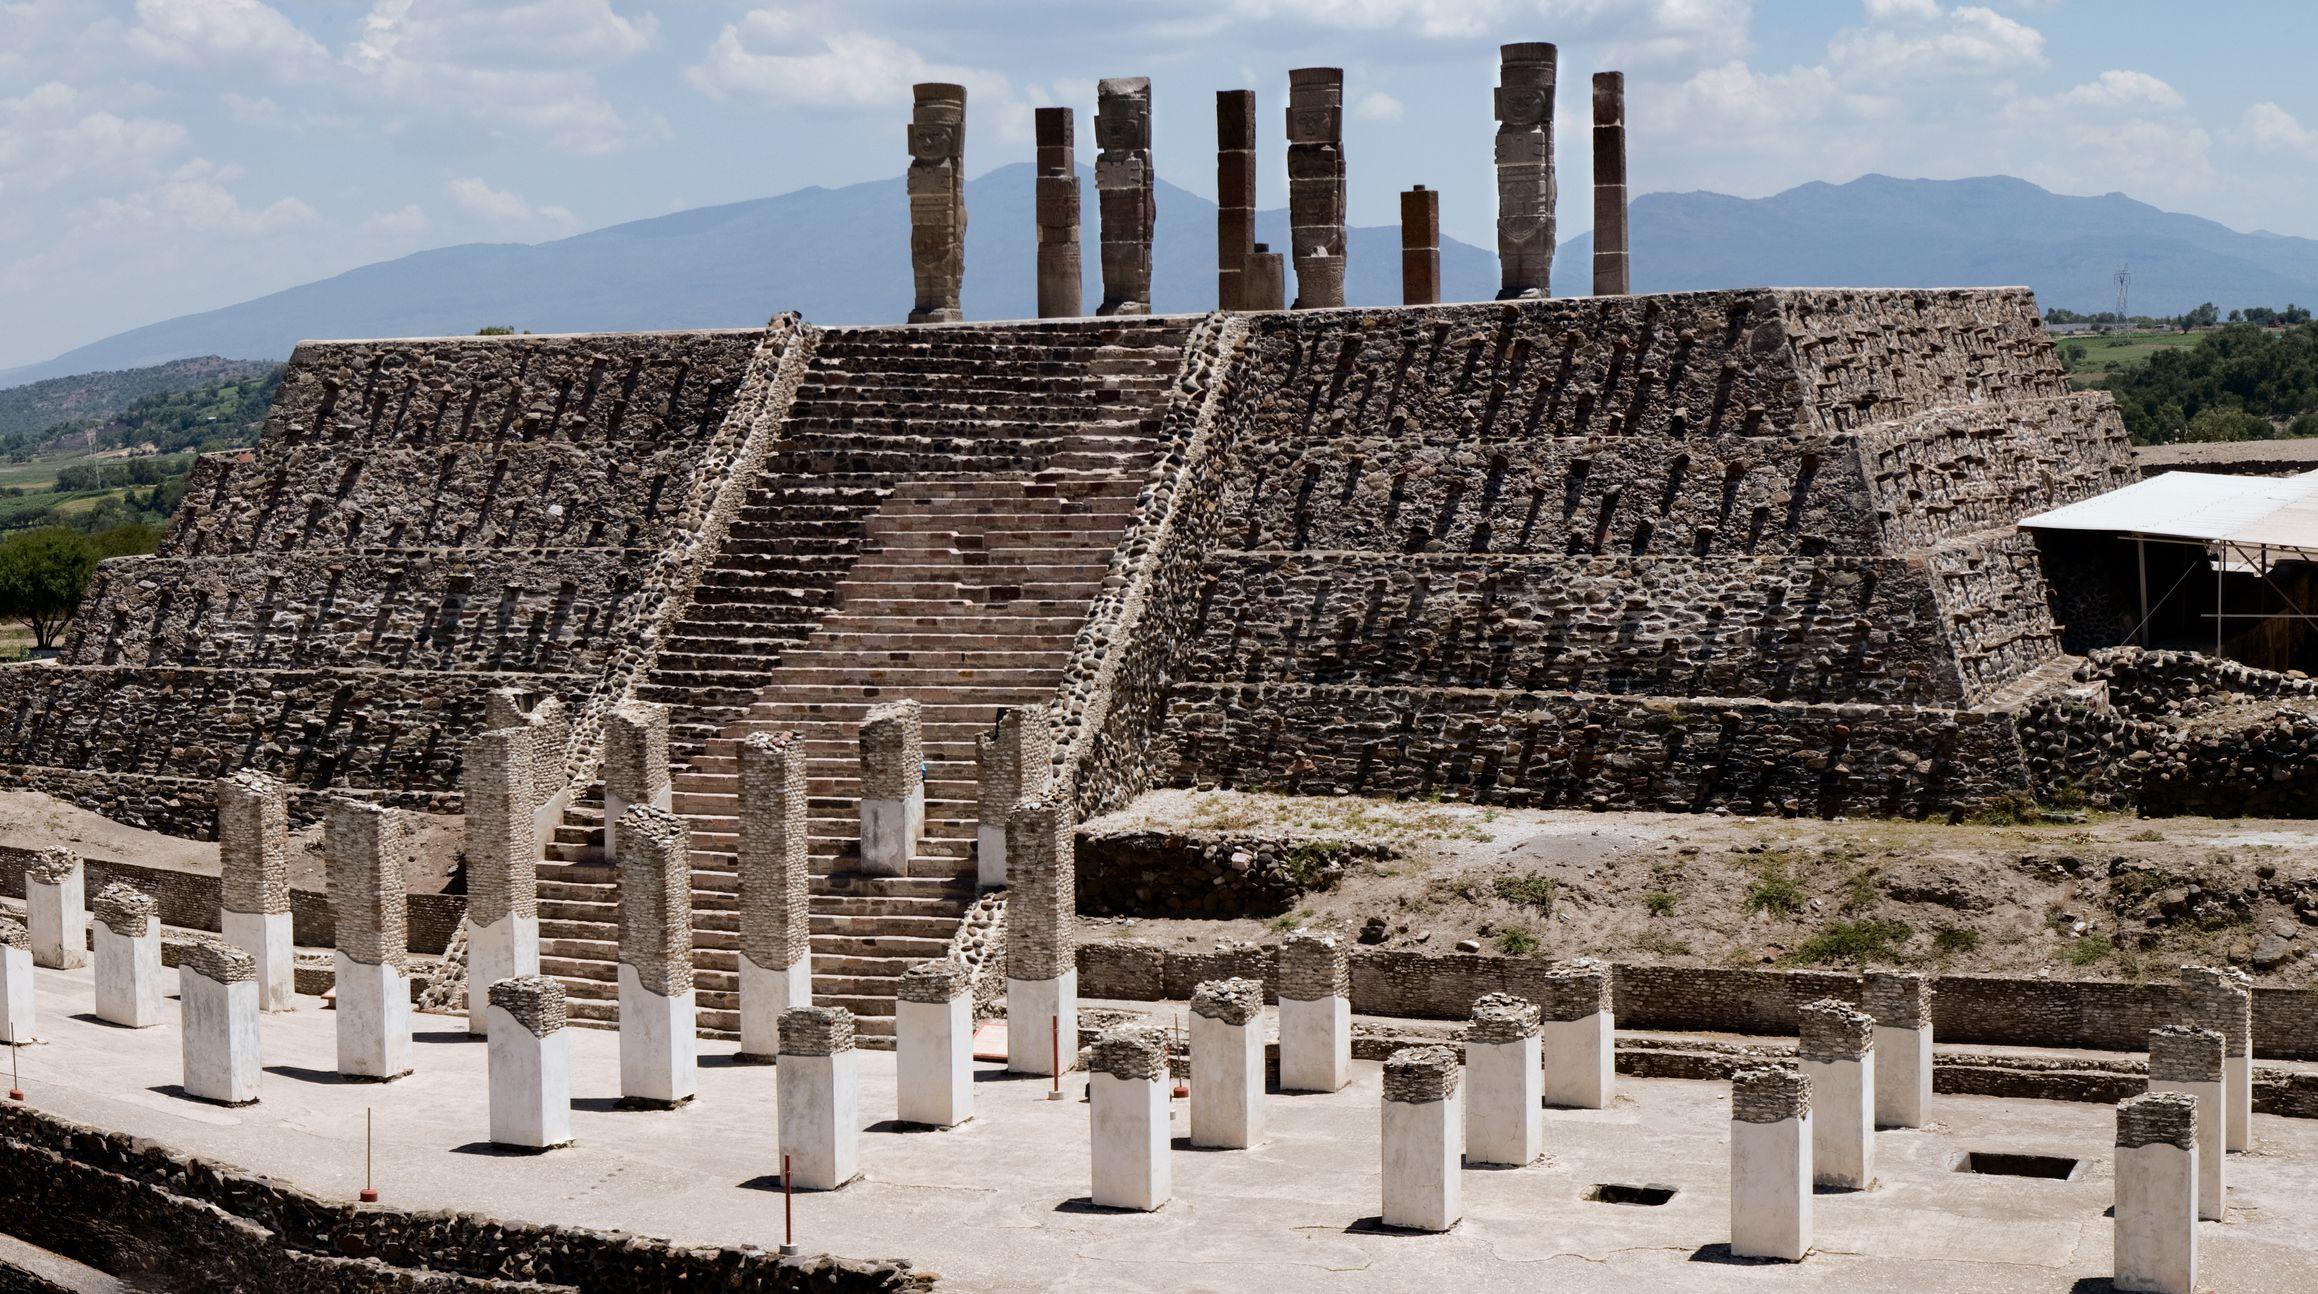 The Atlantes of Tula Archaeological Site